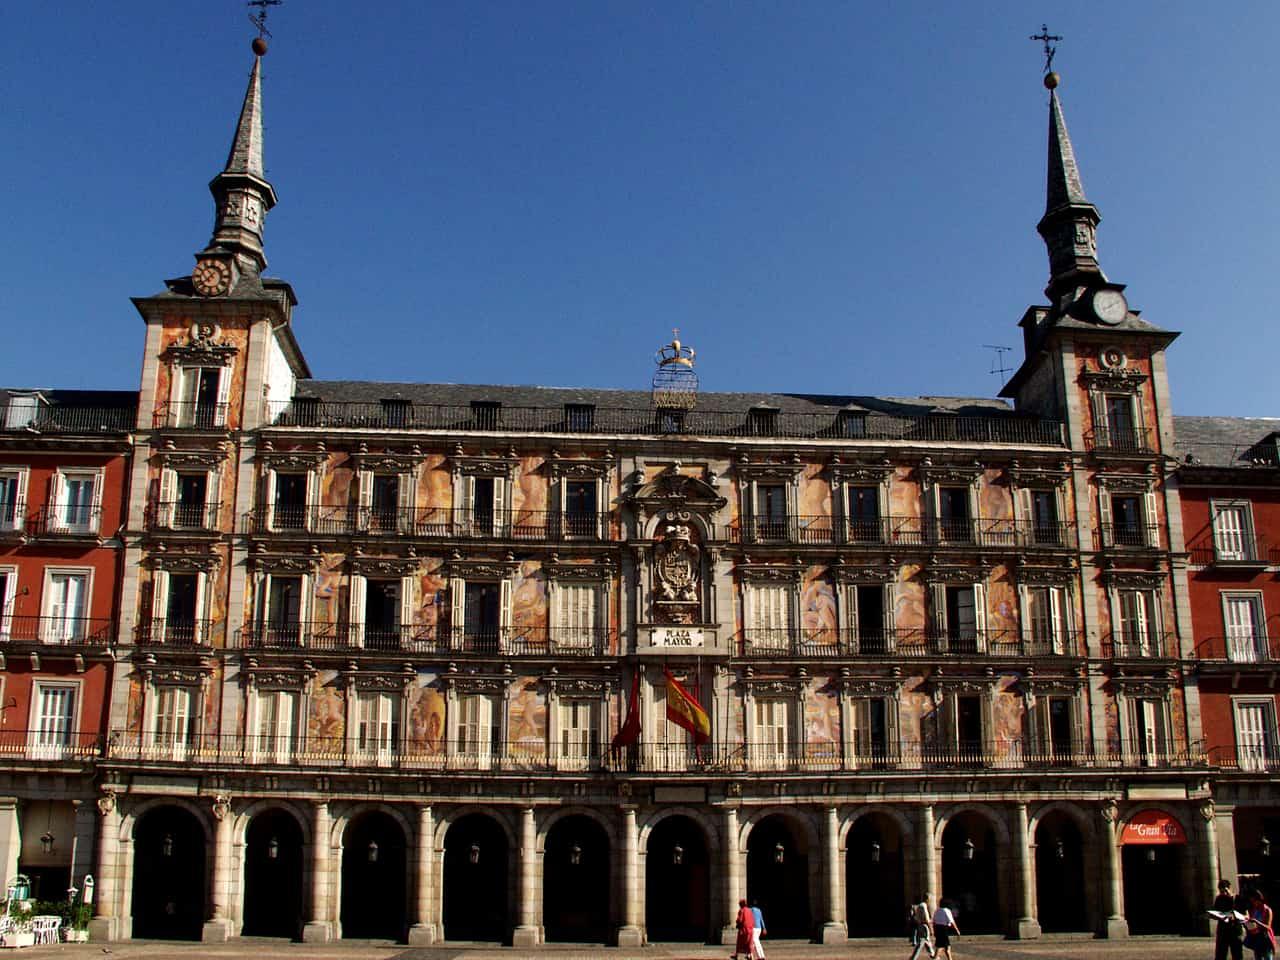 Zona retiro la casa de la carnicer a ser un hotel de lujo - Carniceria en madrid ...